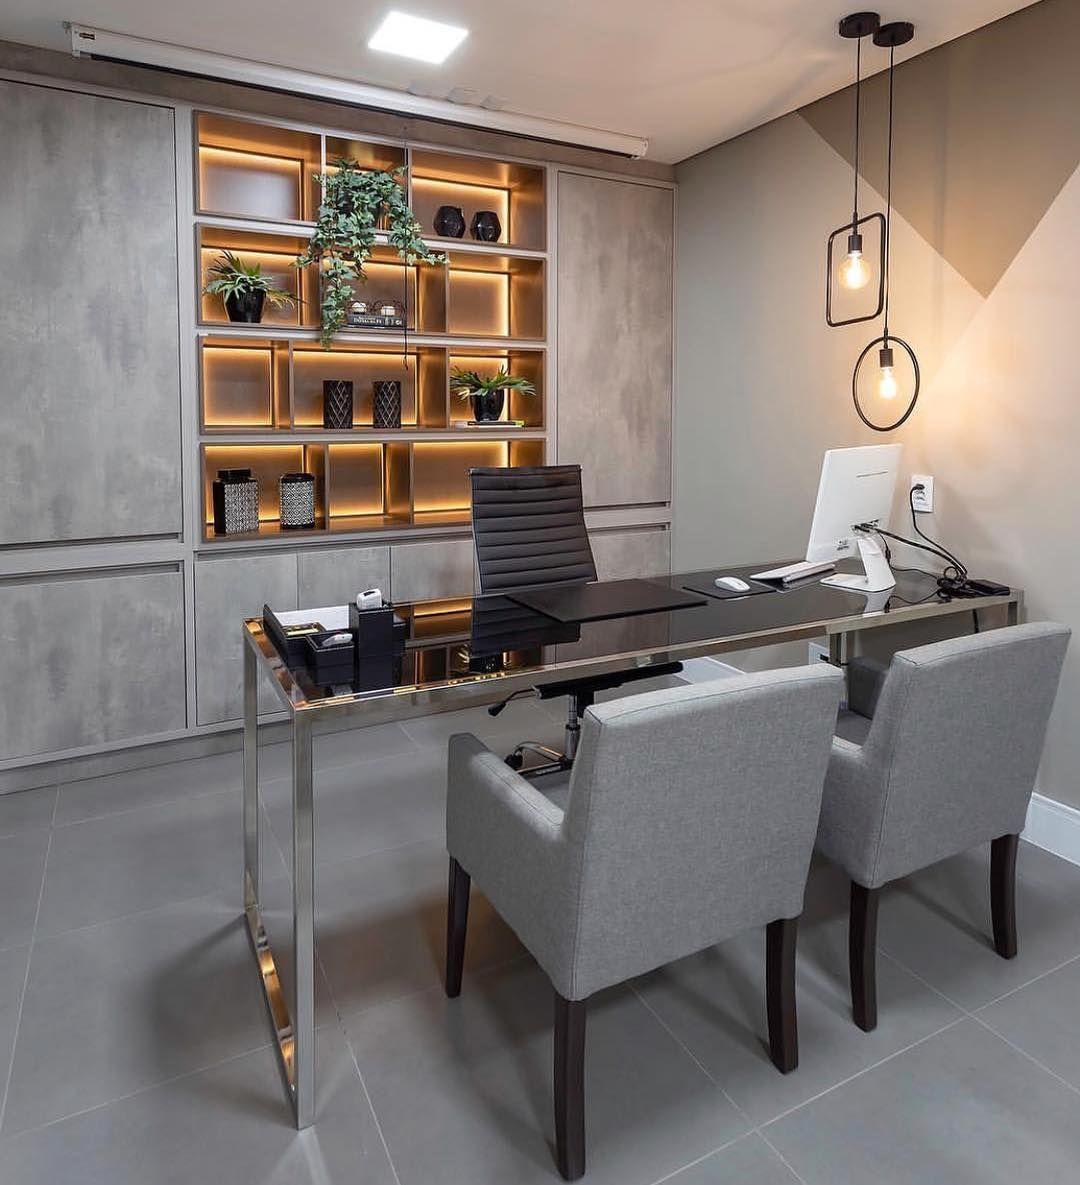 Top 30 Stunning Office Style Homeoffice365 Homeofficechairs Homeofficeorganization Homeoffi Modern Office Interiors Home Office Design Office Furniture Decor